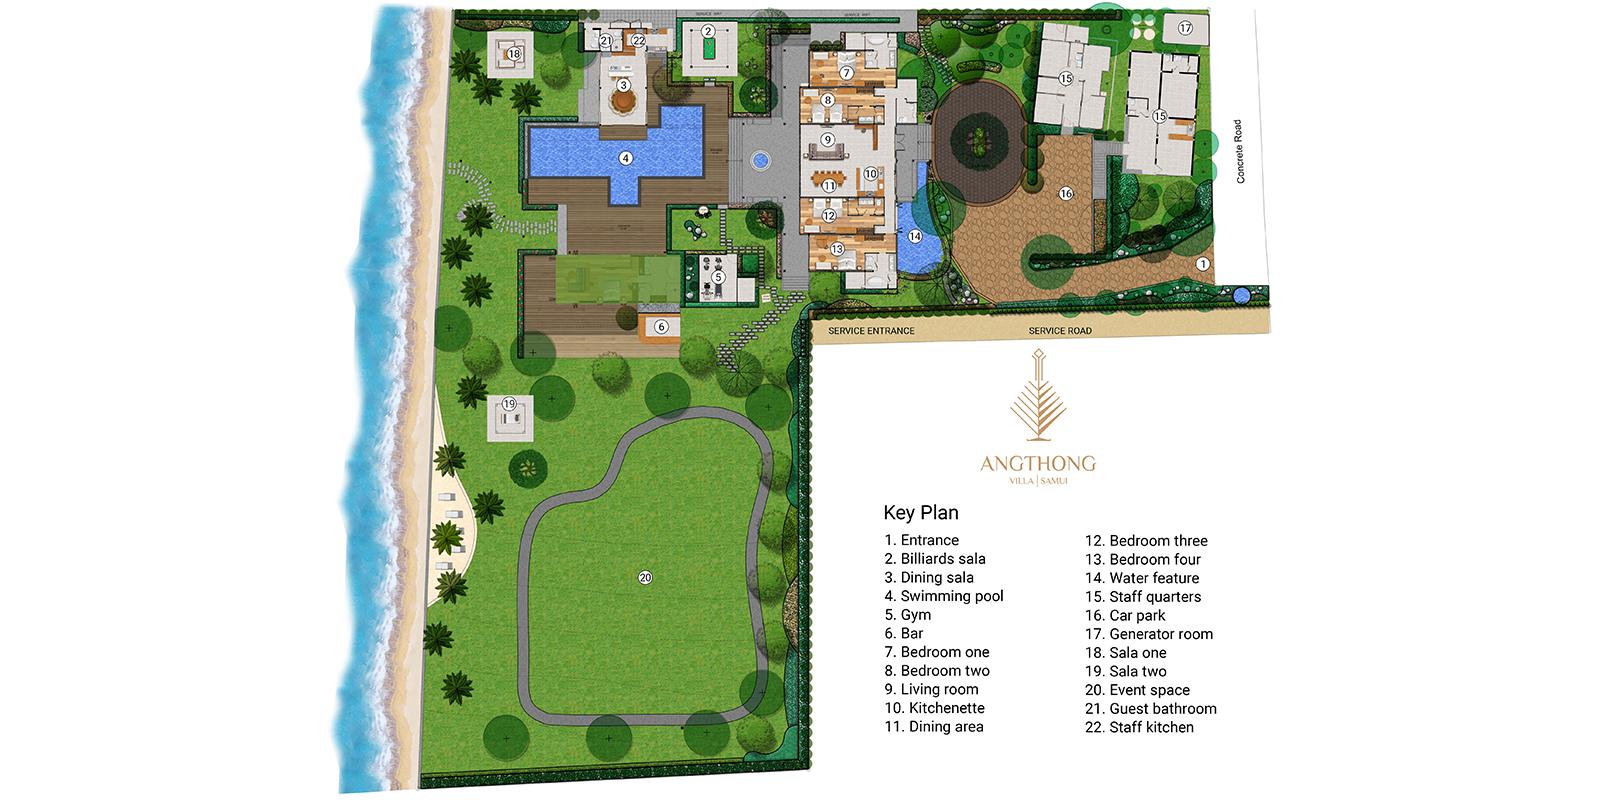 Villa Angthong Floor Plan | Choeng Mon, Koh Samui